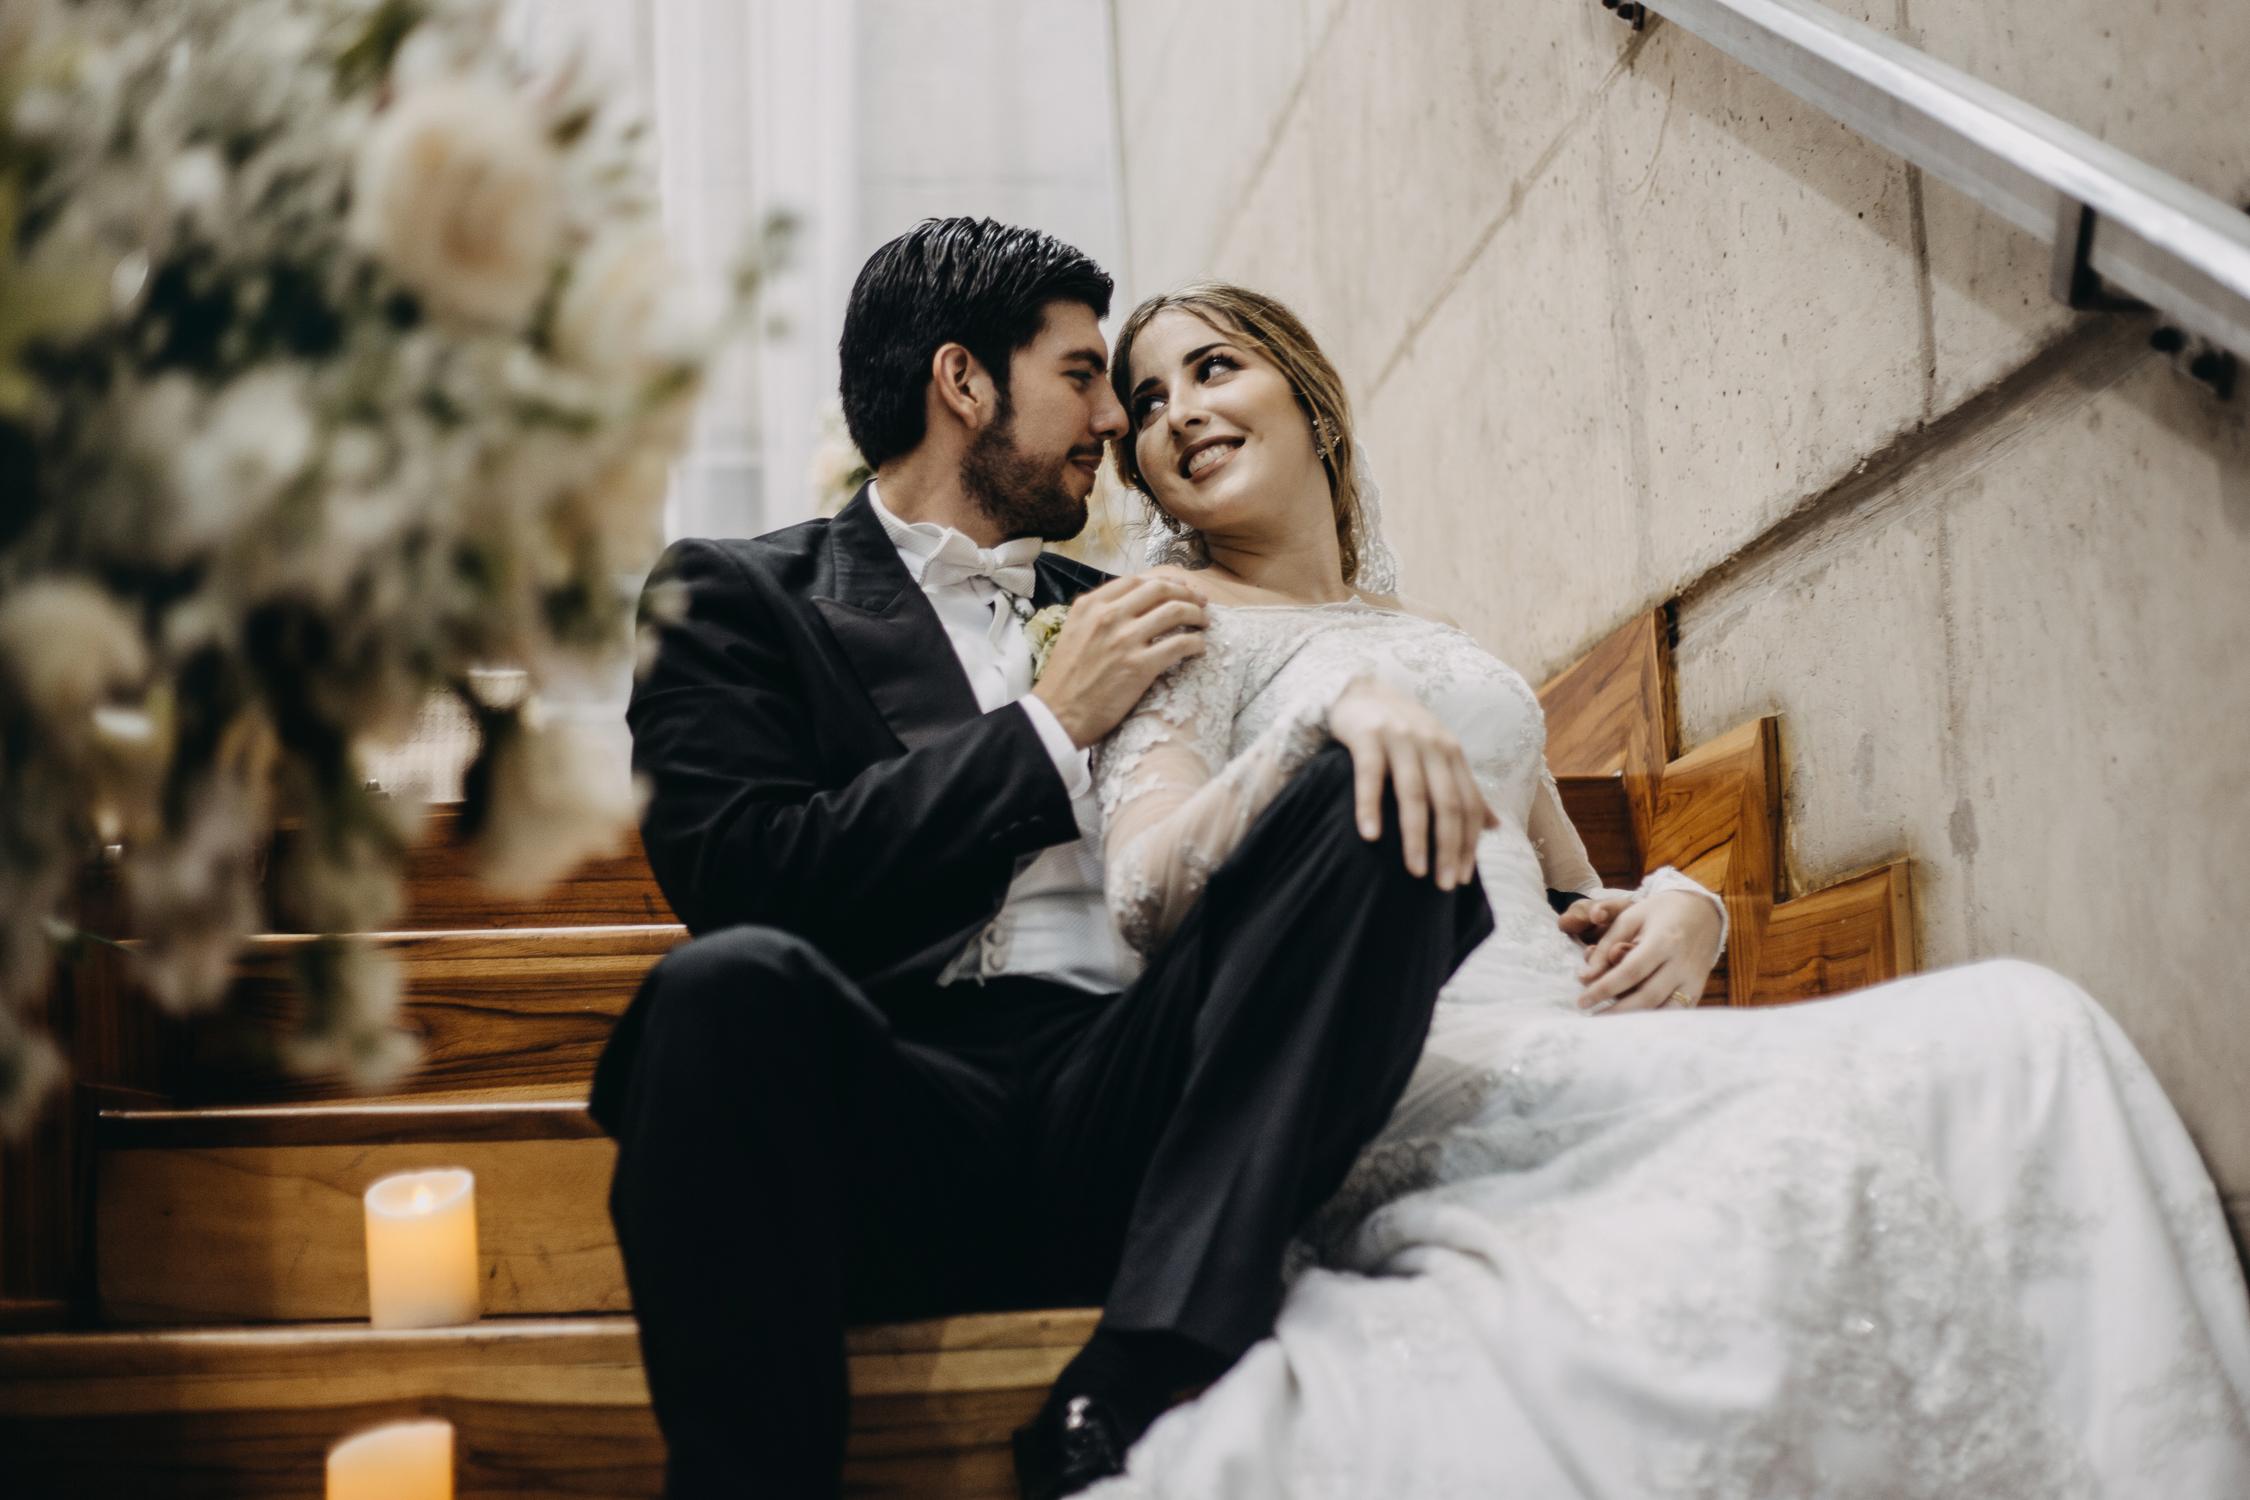 Michelle-Agurto-Fotografia-Bodas-Ecuador-Destination-Wedding-Photographer-Vicky-Javier-201.JPG